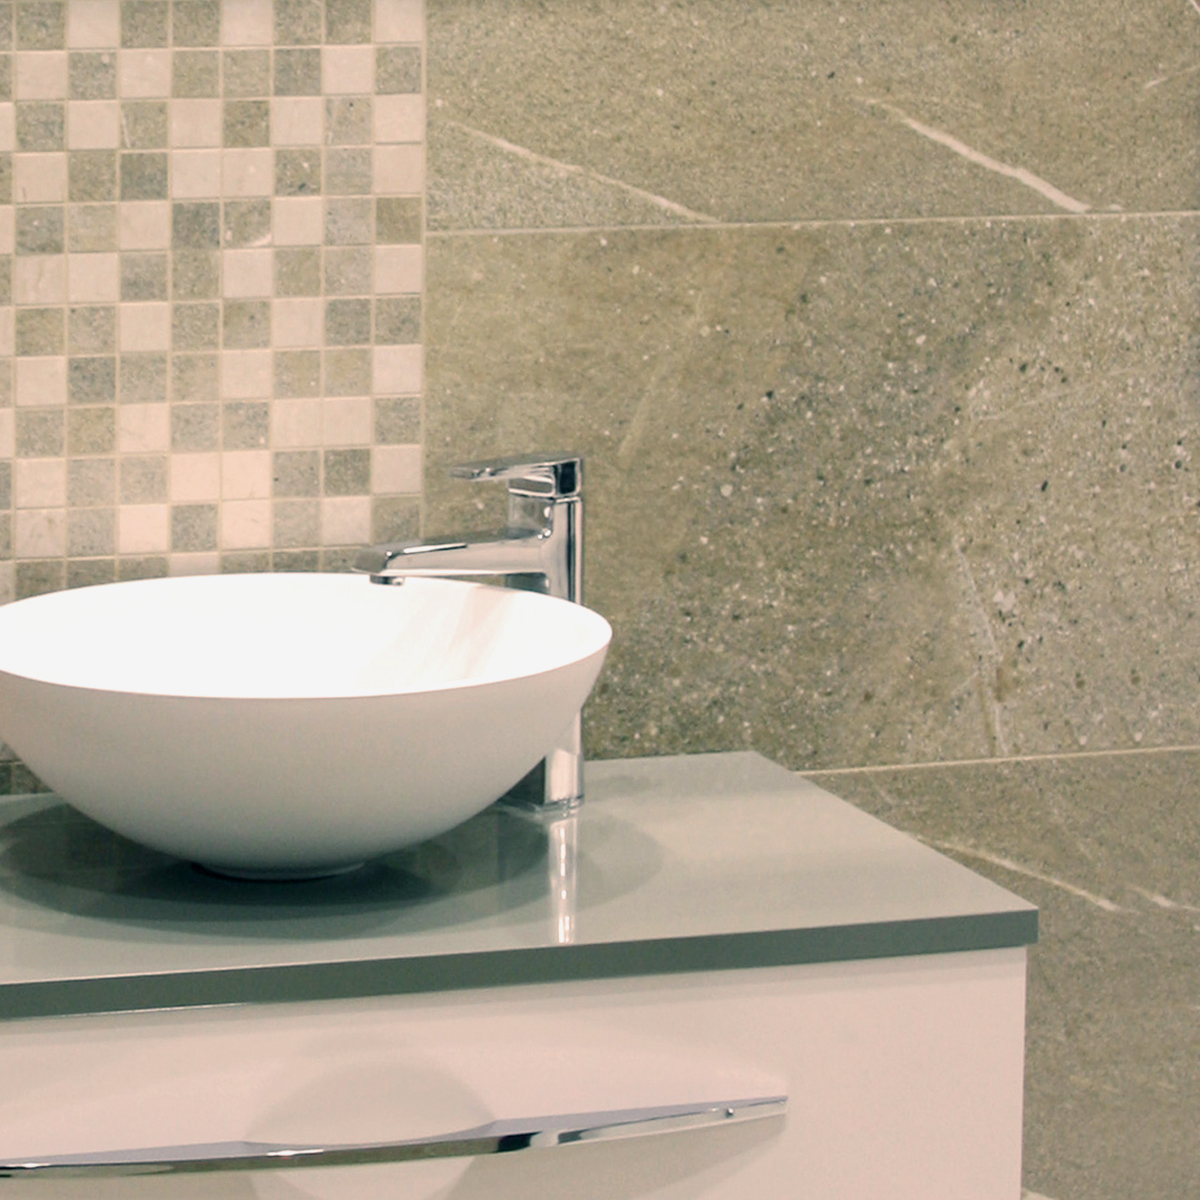 crown tiles bathroom floor tiles bathroom flooring. Black Bedroom Furniture Sets. Home Design Ideas